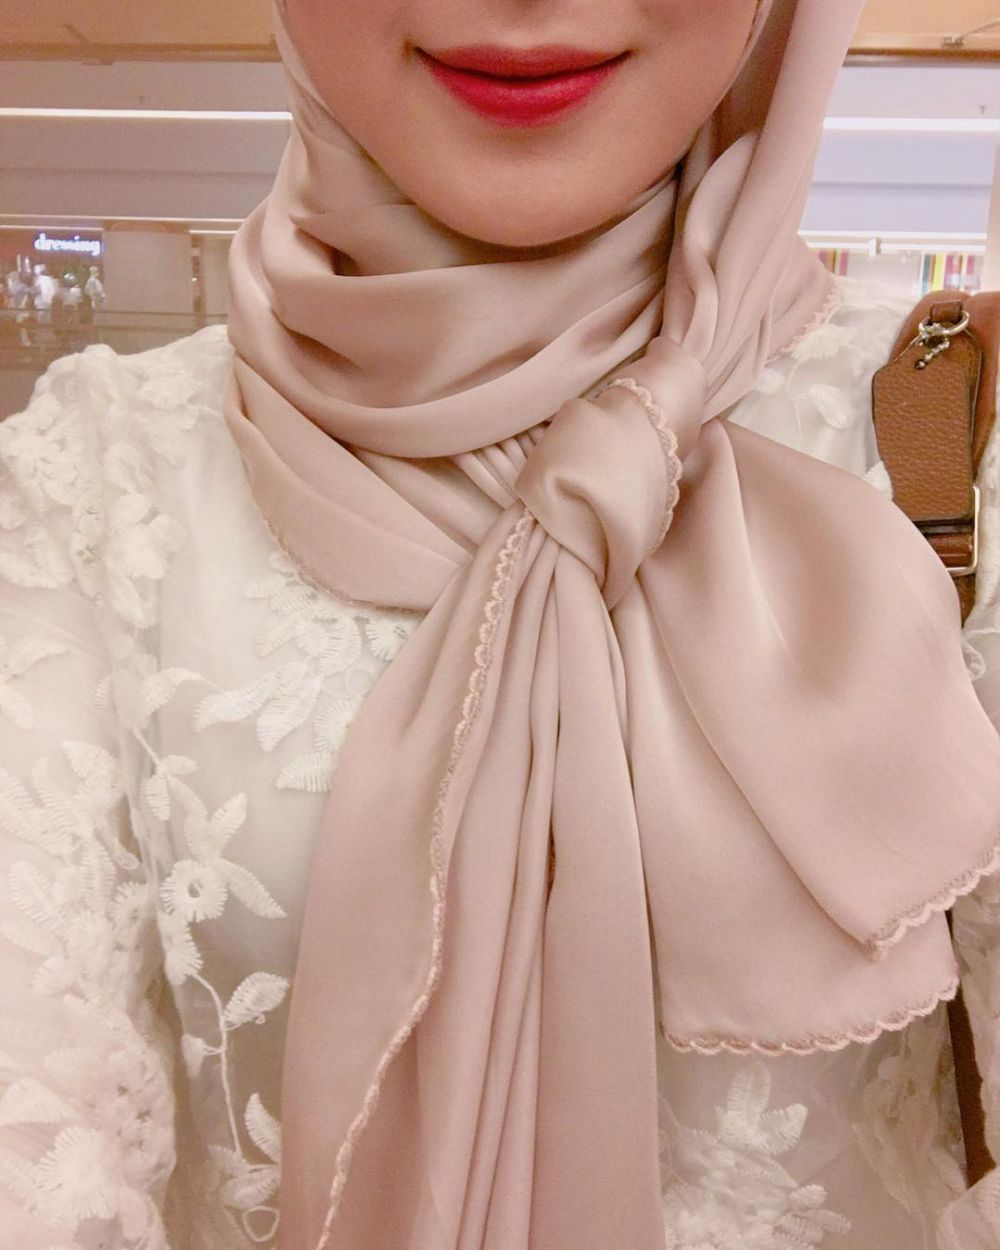 hijab ayana © 2018 brilio.net